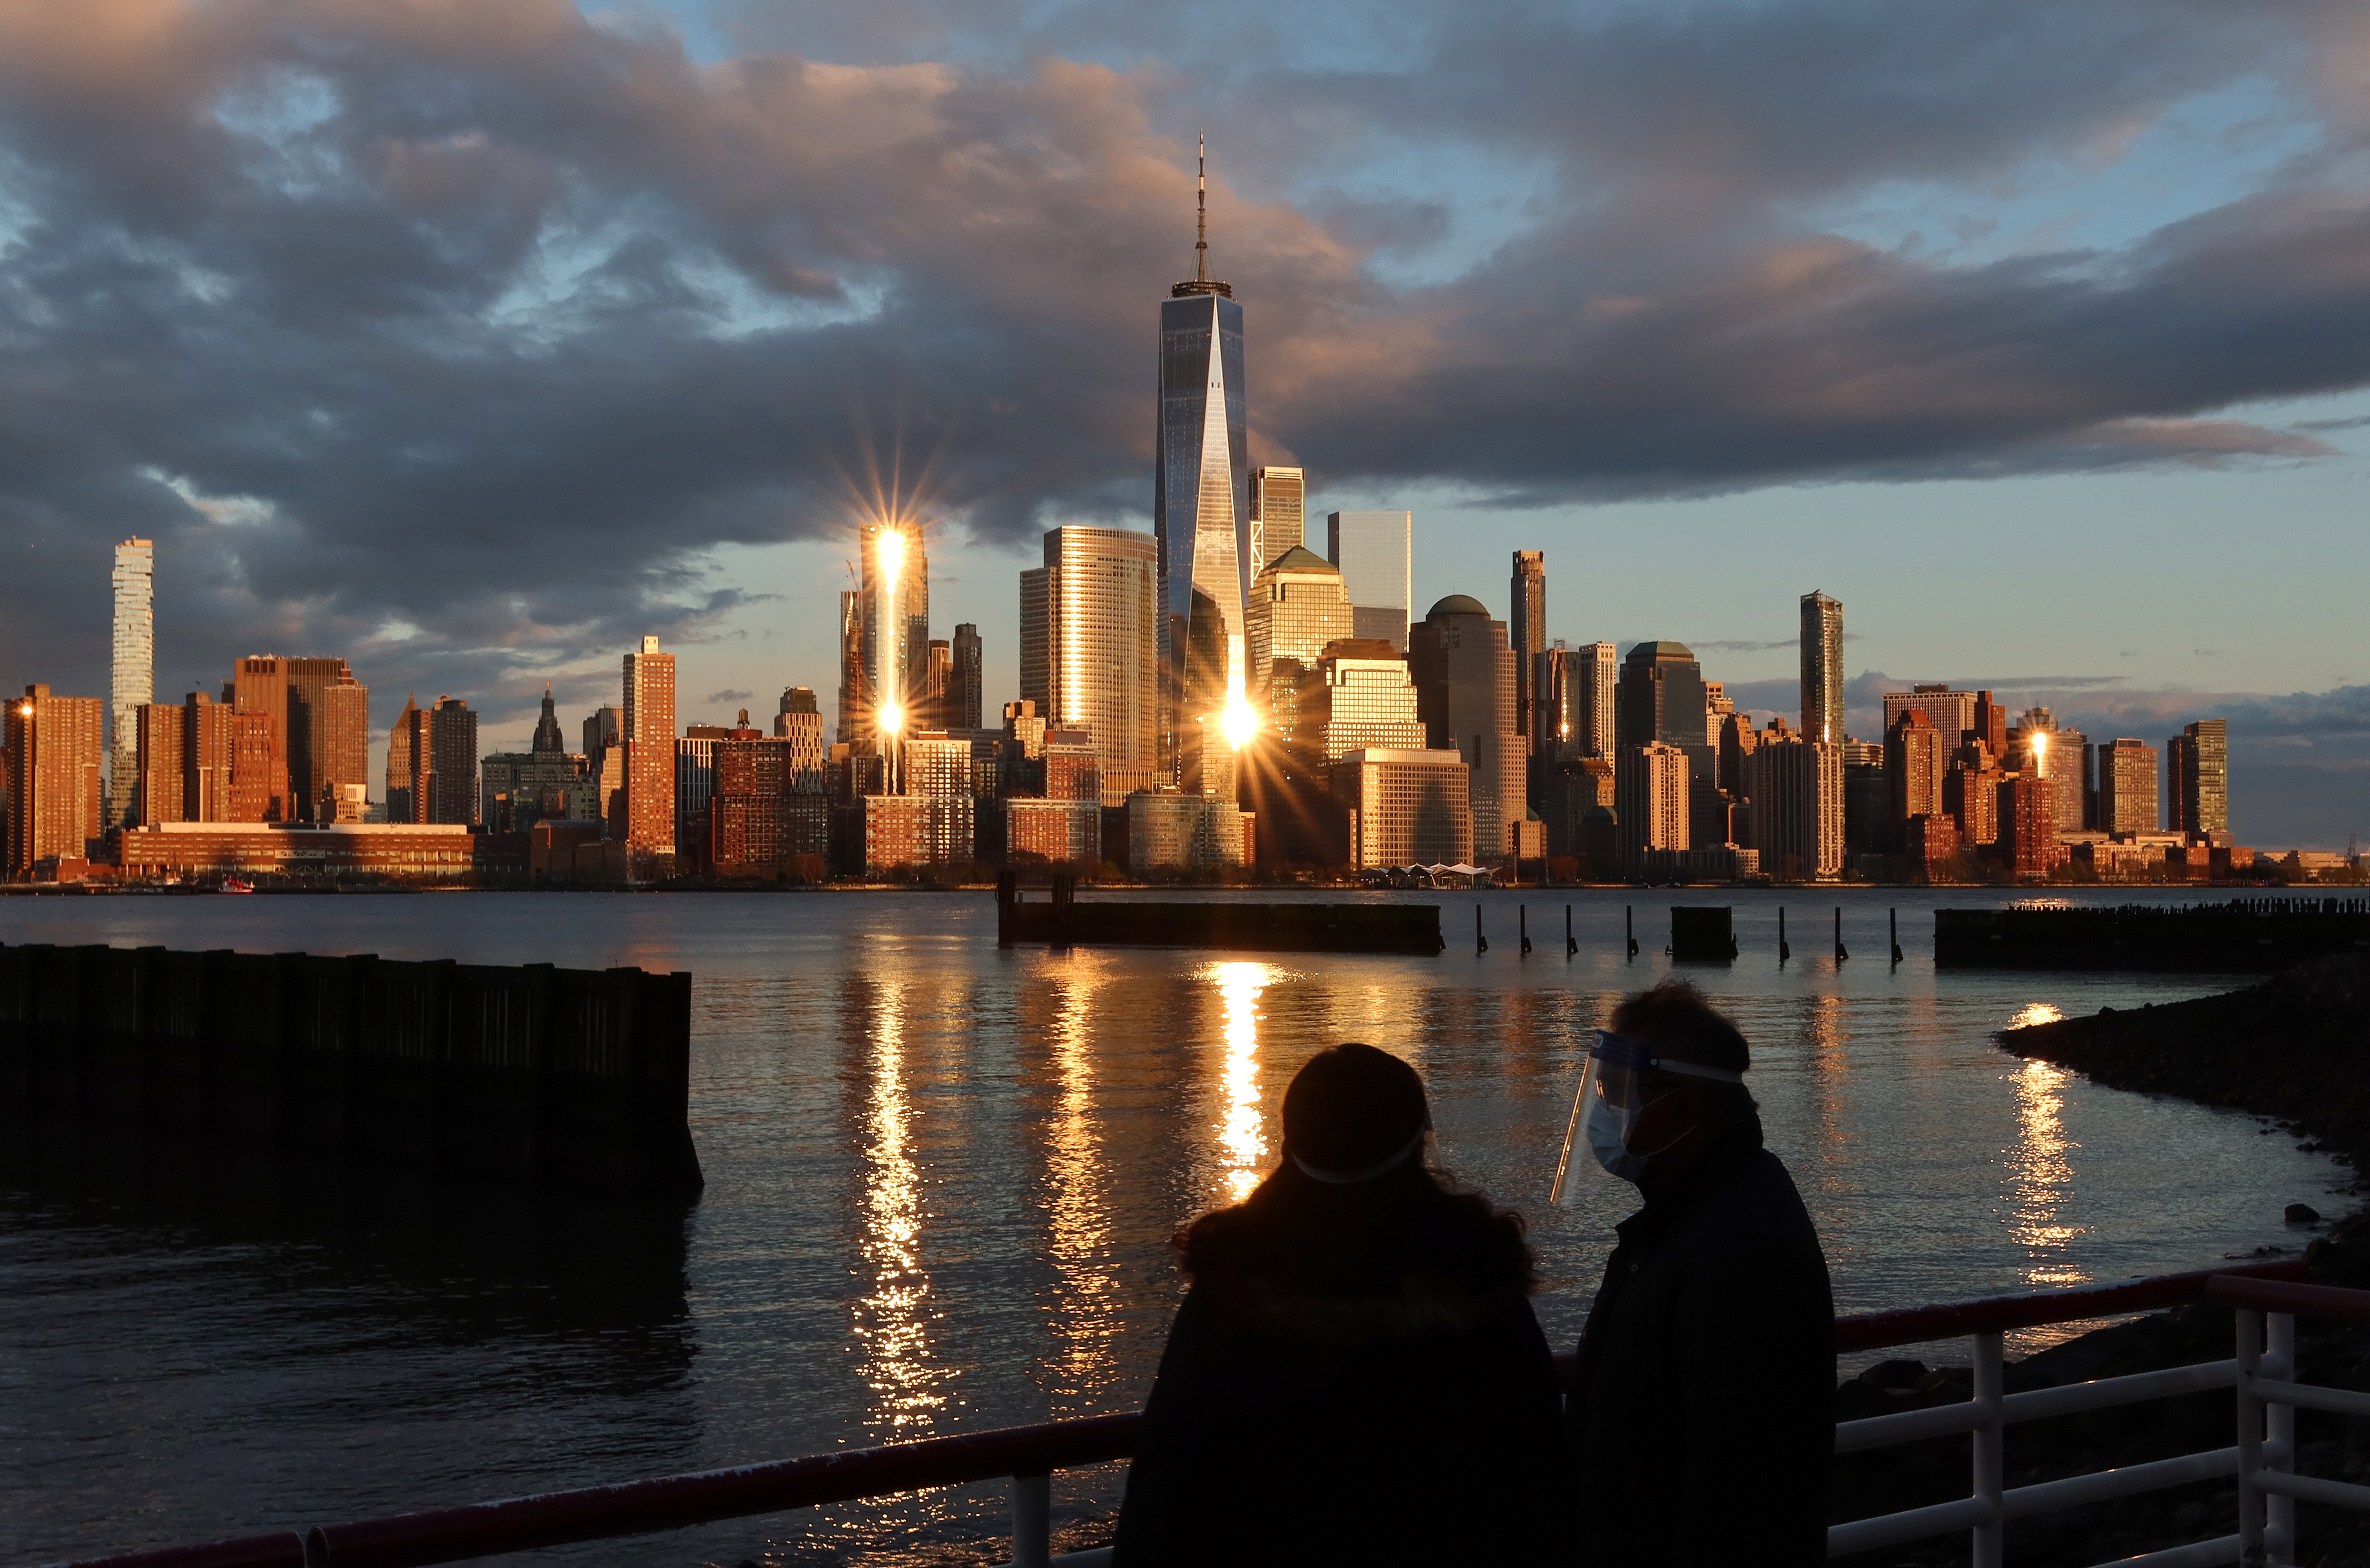 Sunset on Lower Manhattan in New York City